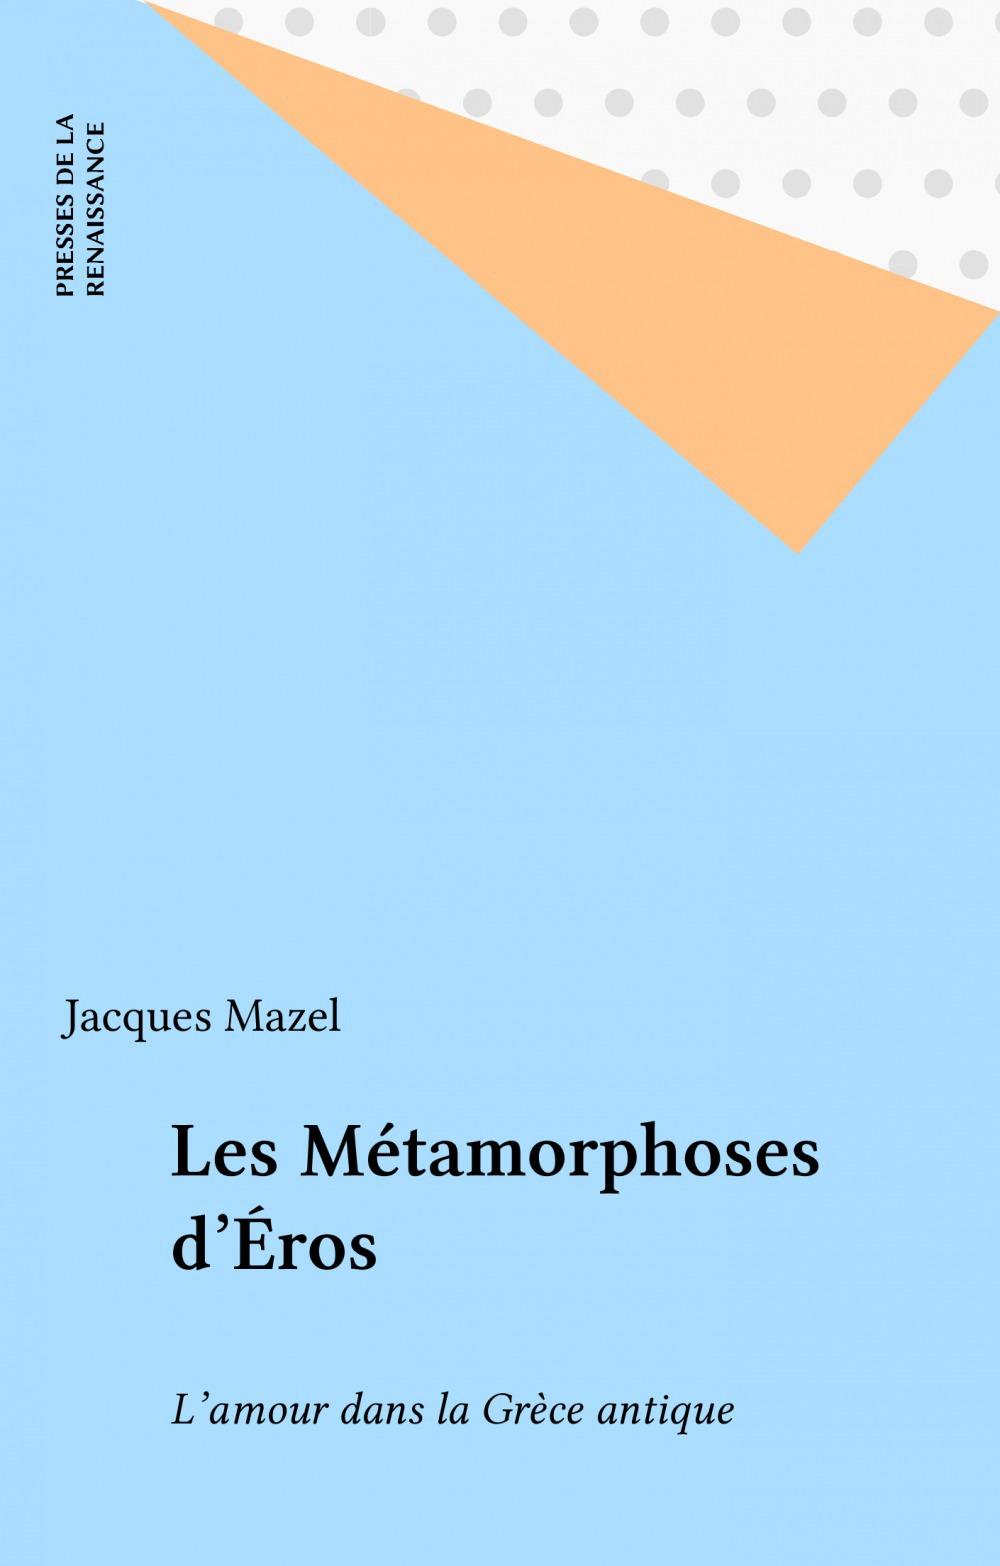 Les metamorphoses d'eros